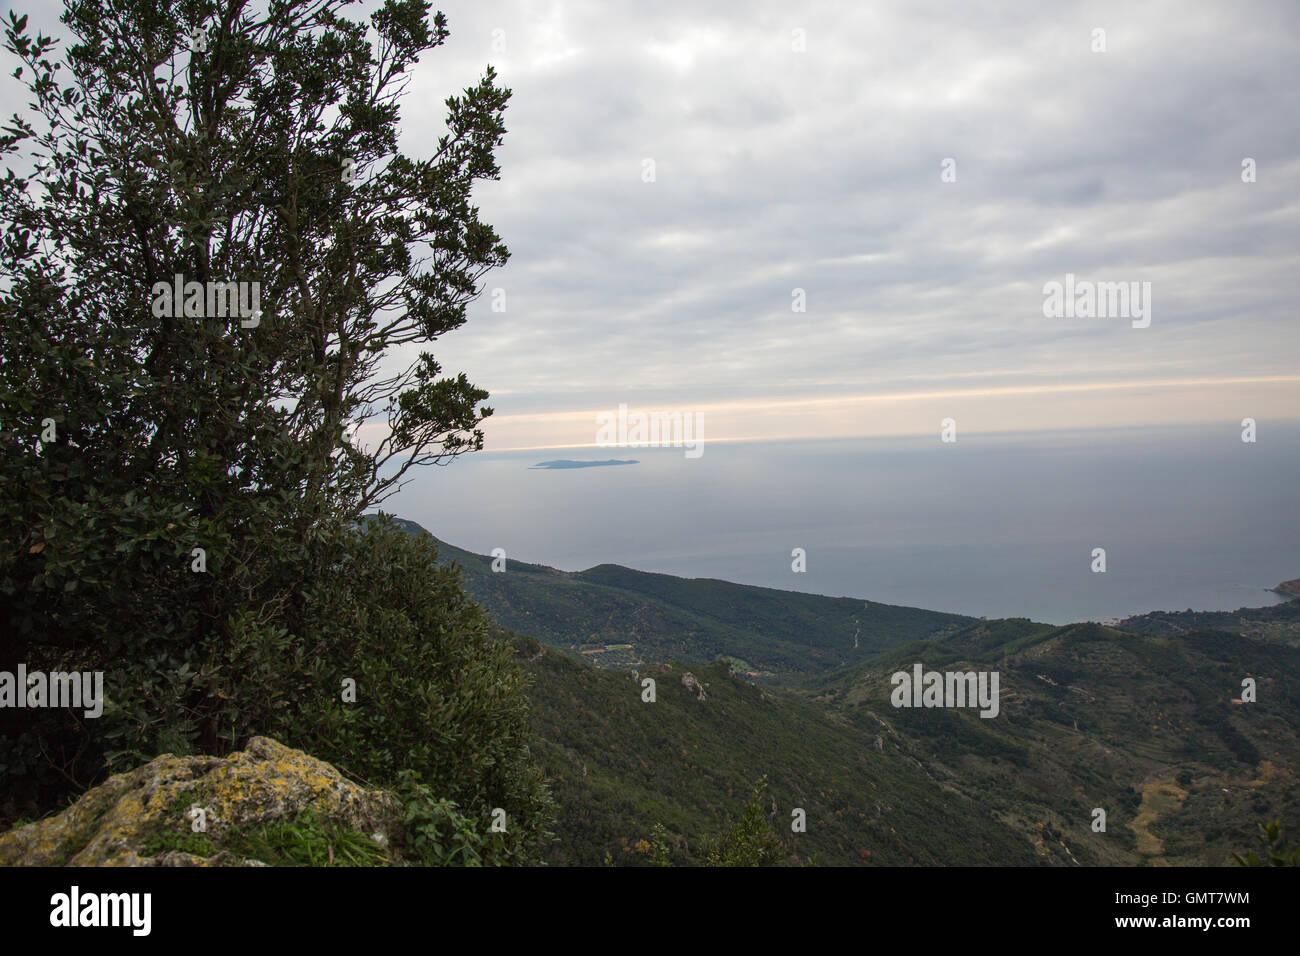 Panorama from Monte Argentario on the Tyrrhenian Sea - Stock Image